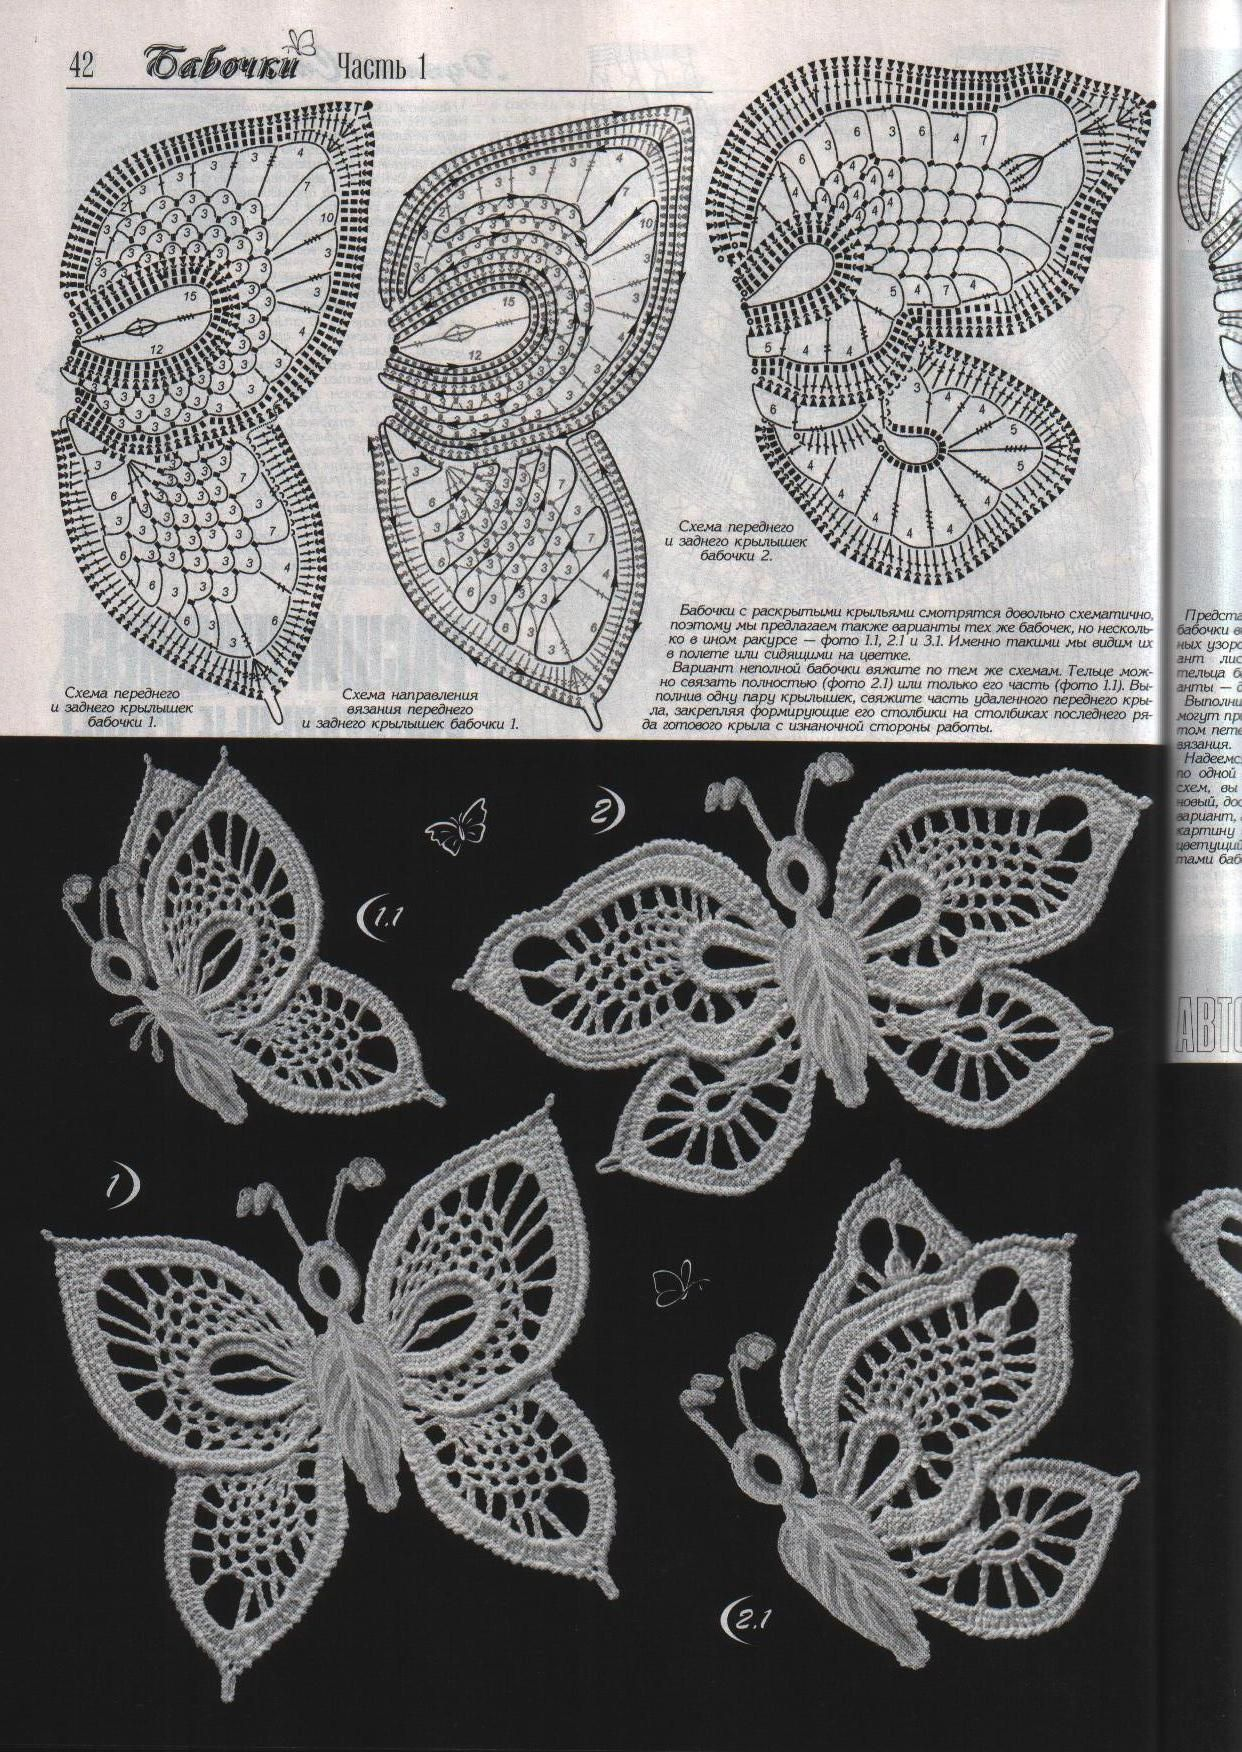 imgbox - fast, simple image host | Irish crochet | Pinterest ...